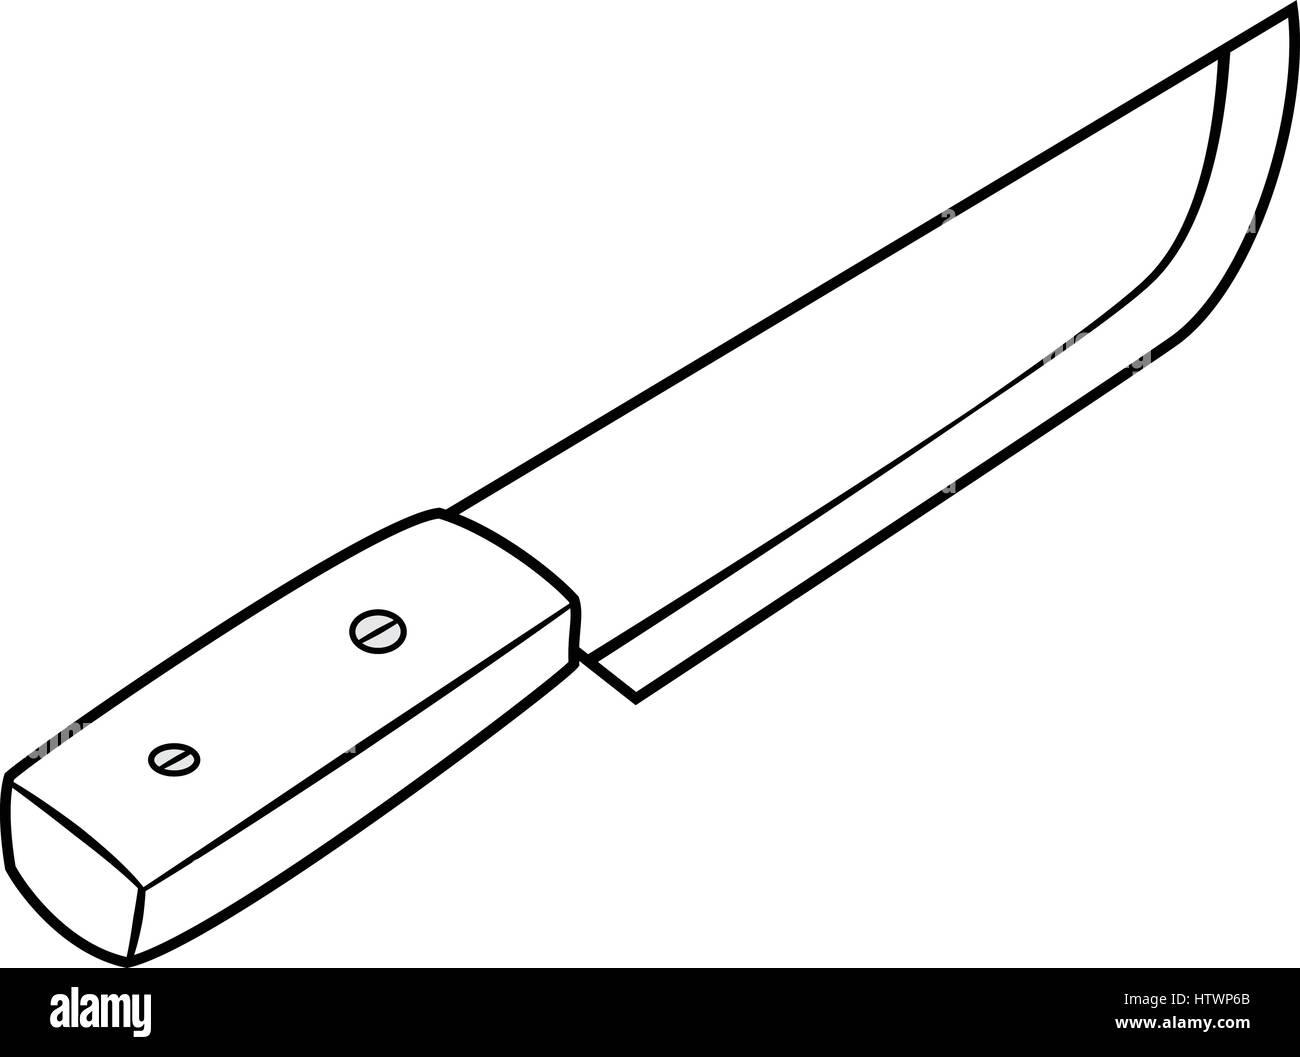 Chef knife illustration